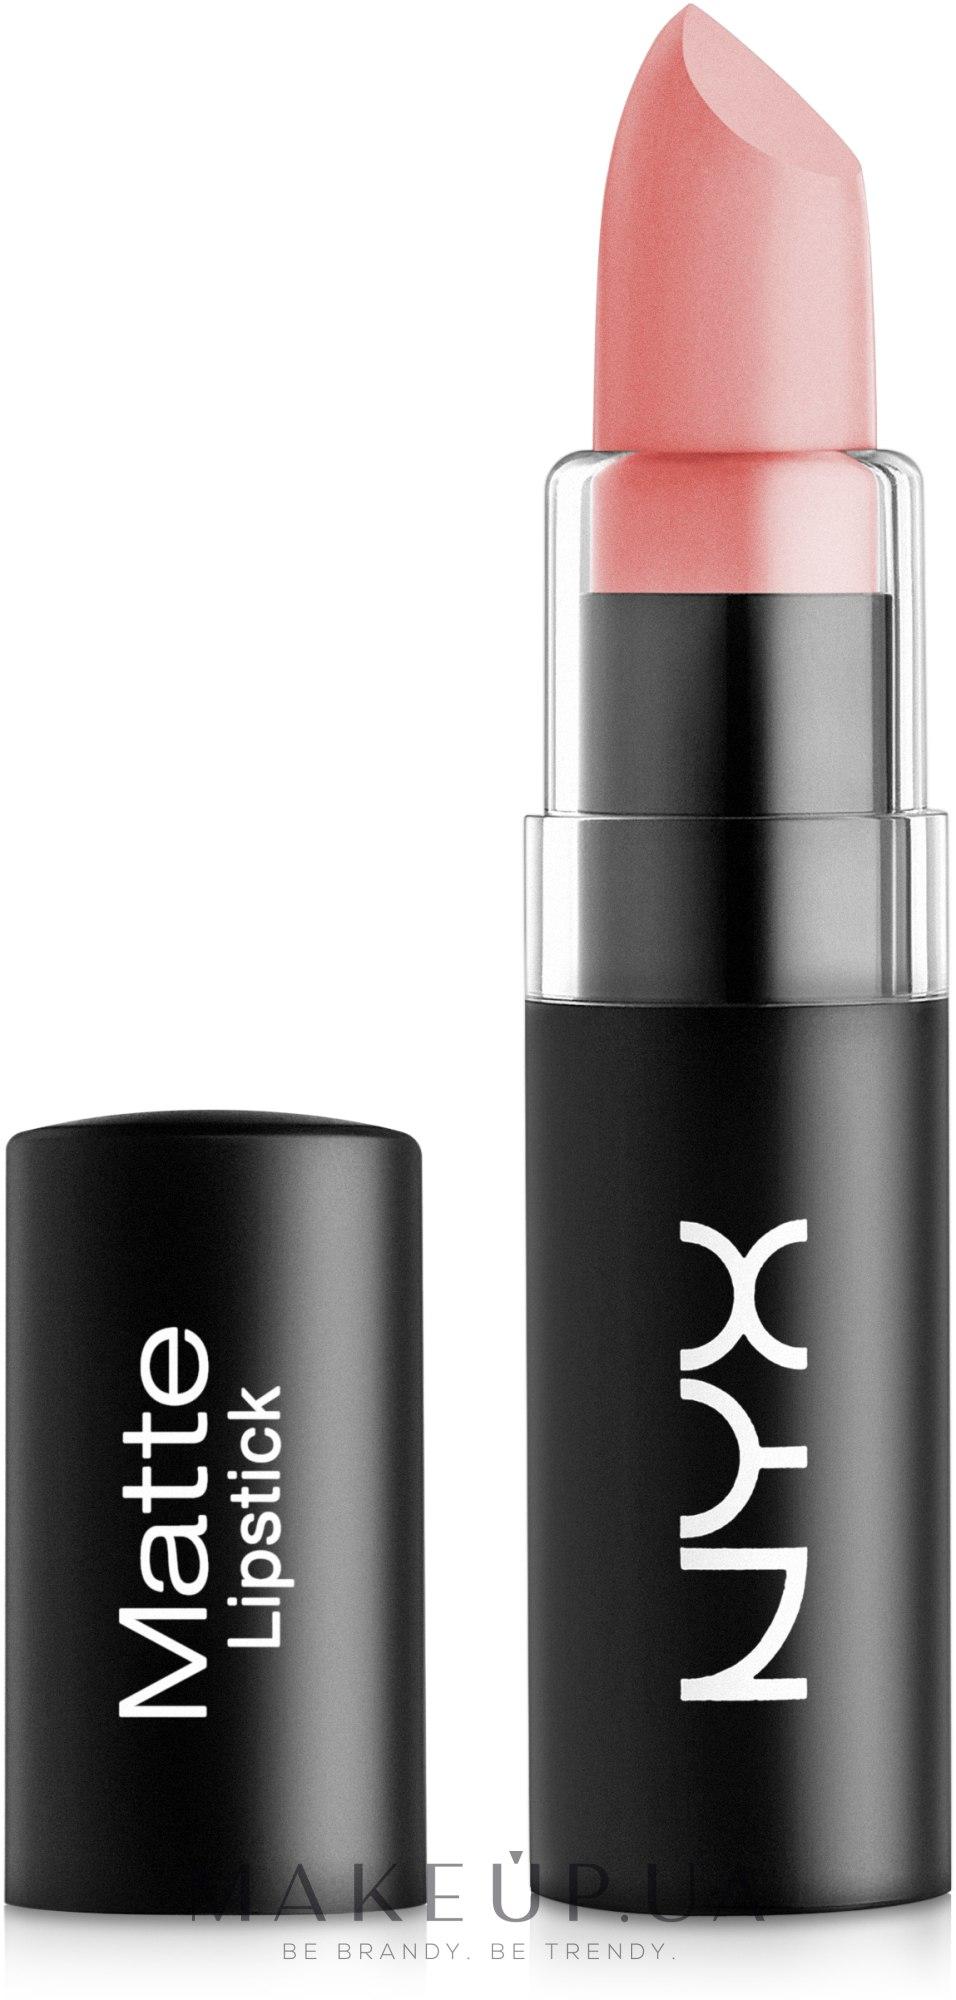 Makeup матовая помада для губ Nyx Professional Makeup Matte